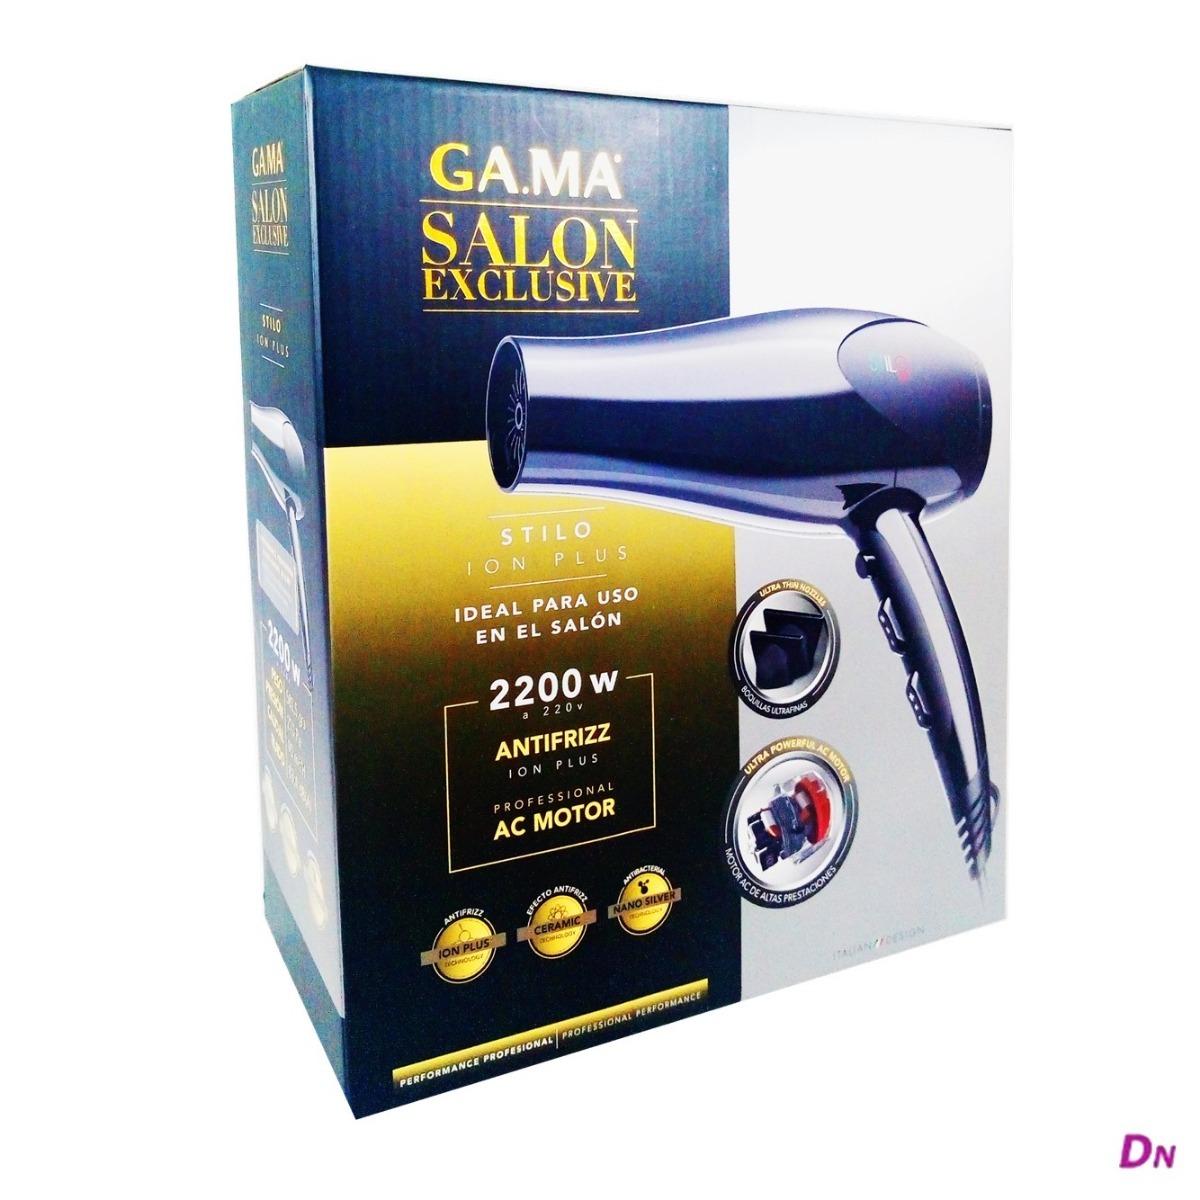 secador de pelo gama salon exclusive stilo ion plus 2200w. Cargando zoom. c4a4767e6fbb